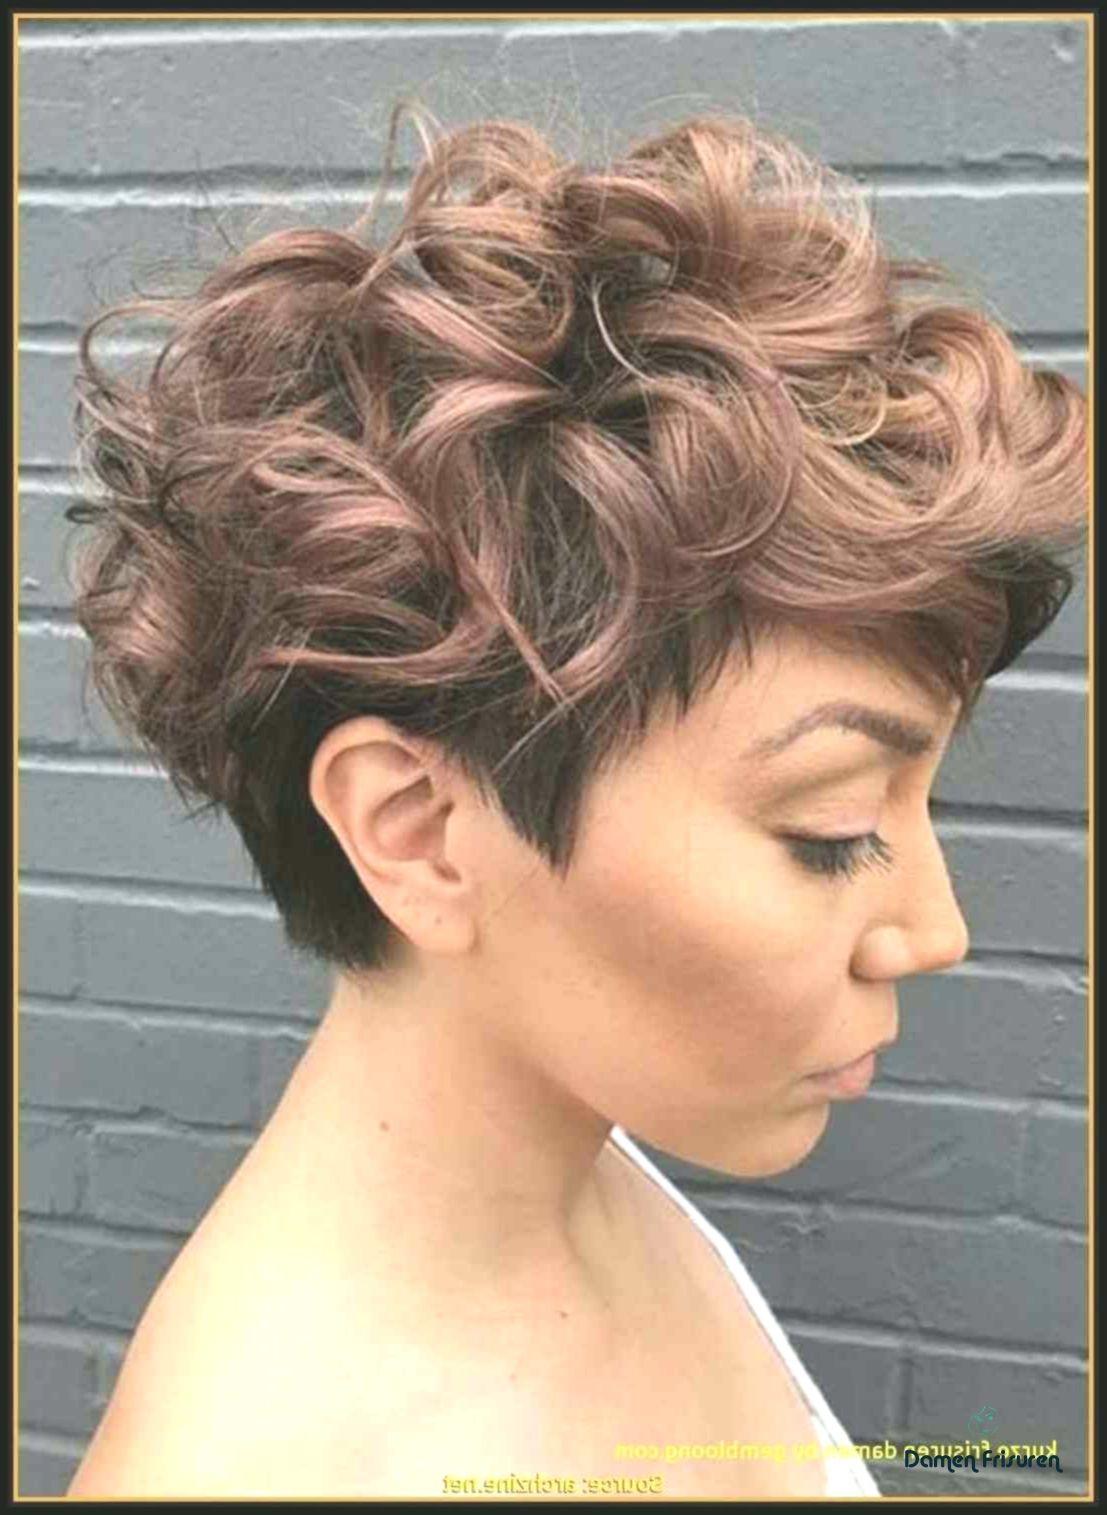 frisur kurze haare mädchen | frisuren, frauen frisuren